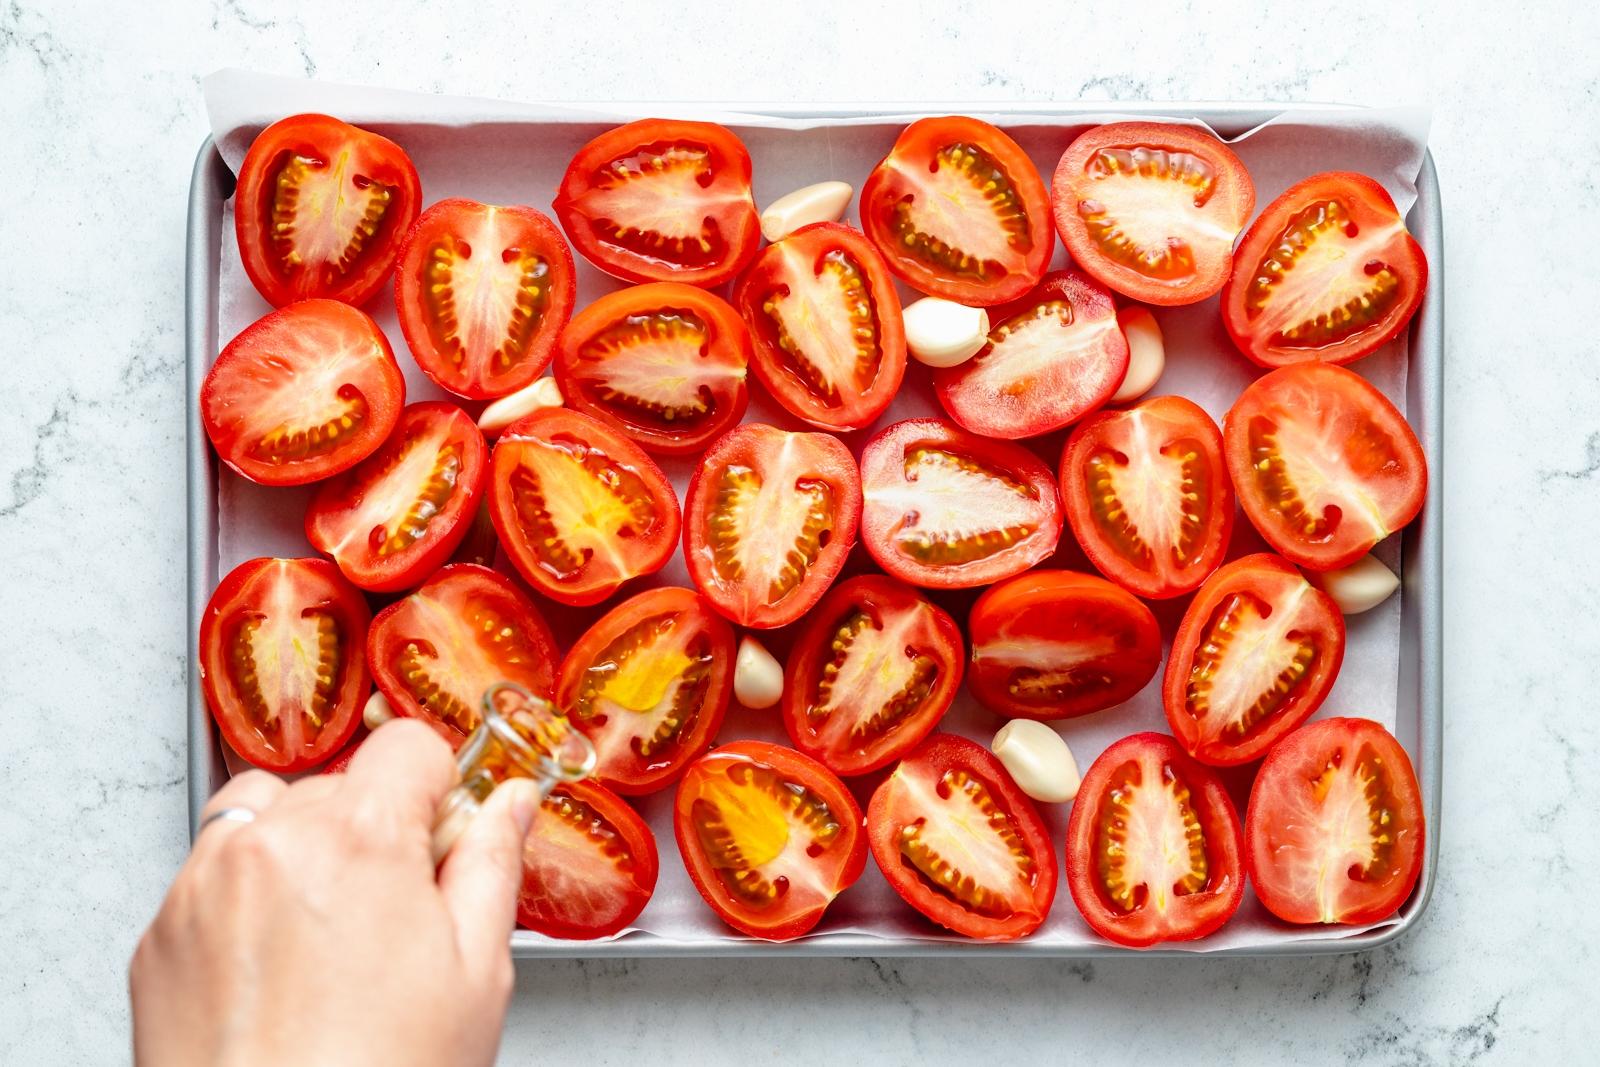 tomatoes and garlic on a baking sheet to make tomato sauce